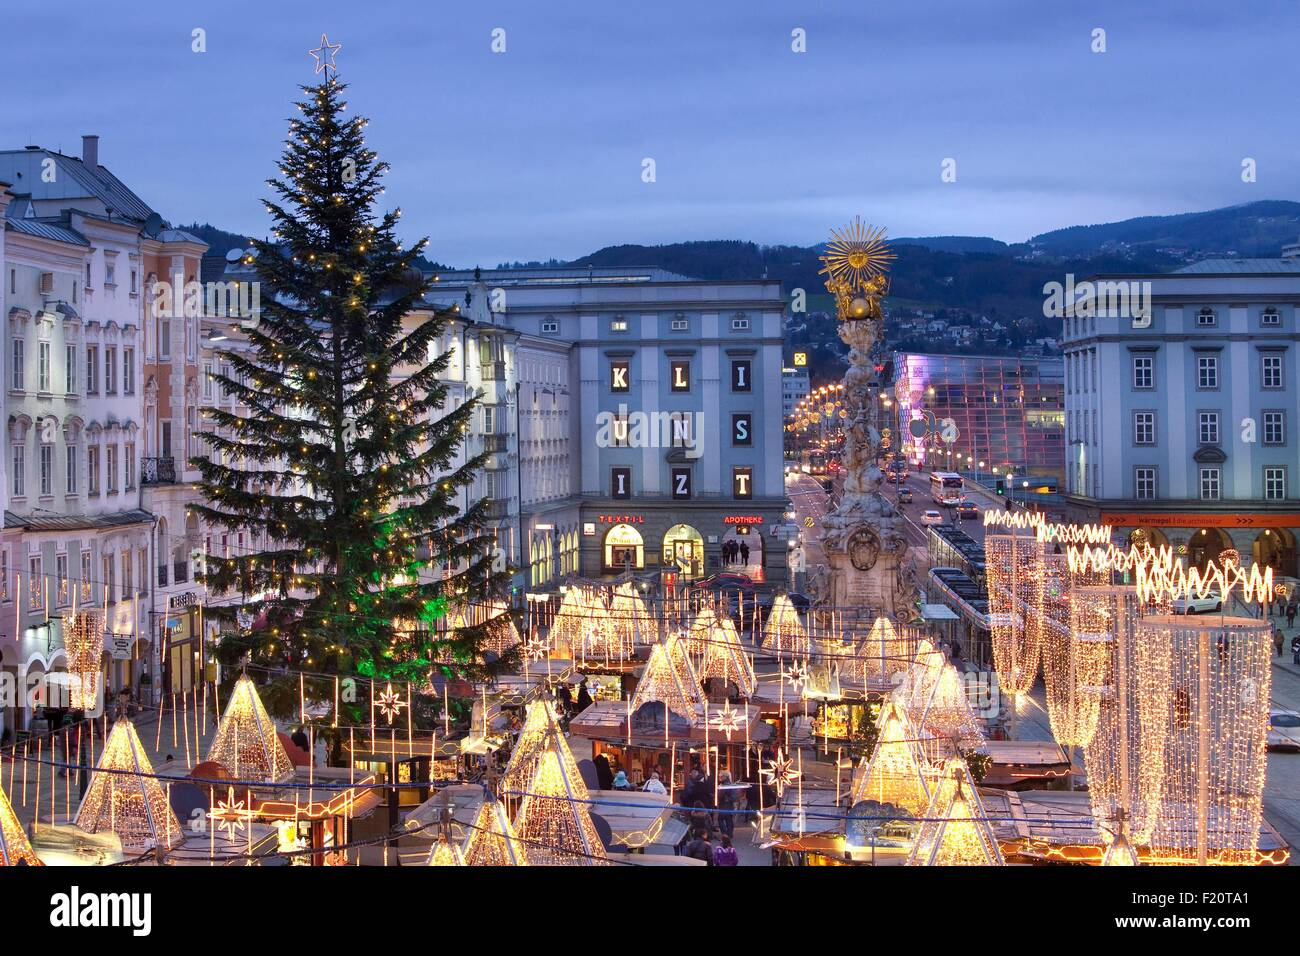 Christmas In Austria.Austria Upper Austria Linz Hauptplatz Christmas Market At